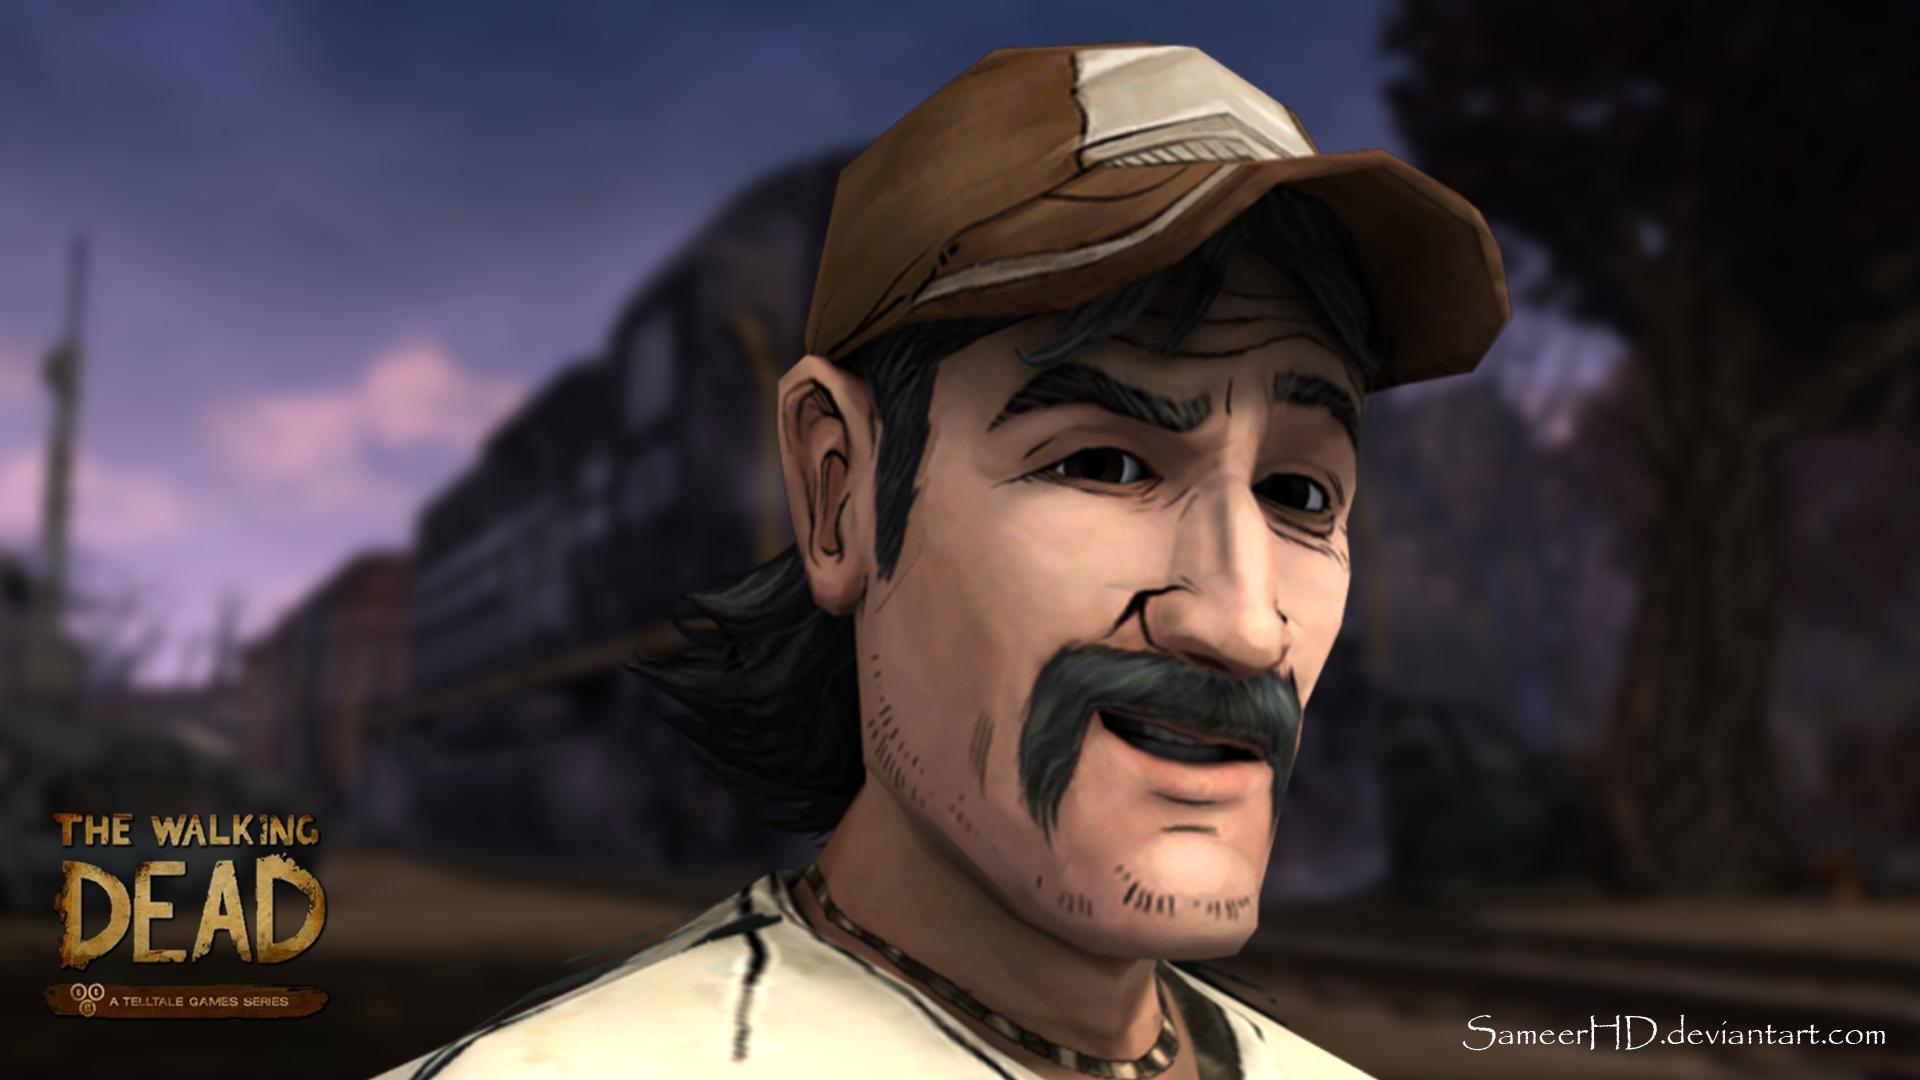 The Walking Dead Game Kenny Wallpaper by SameerHD 1920x1080